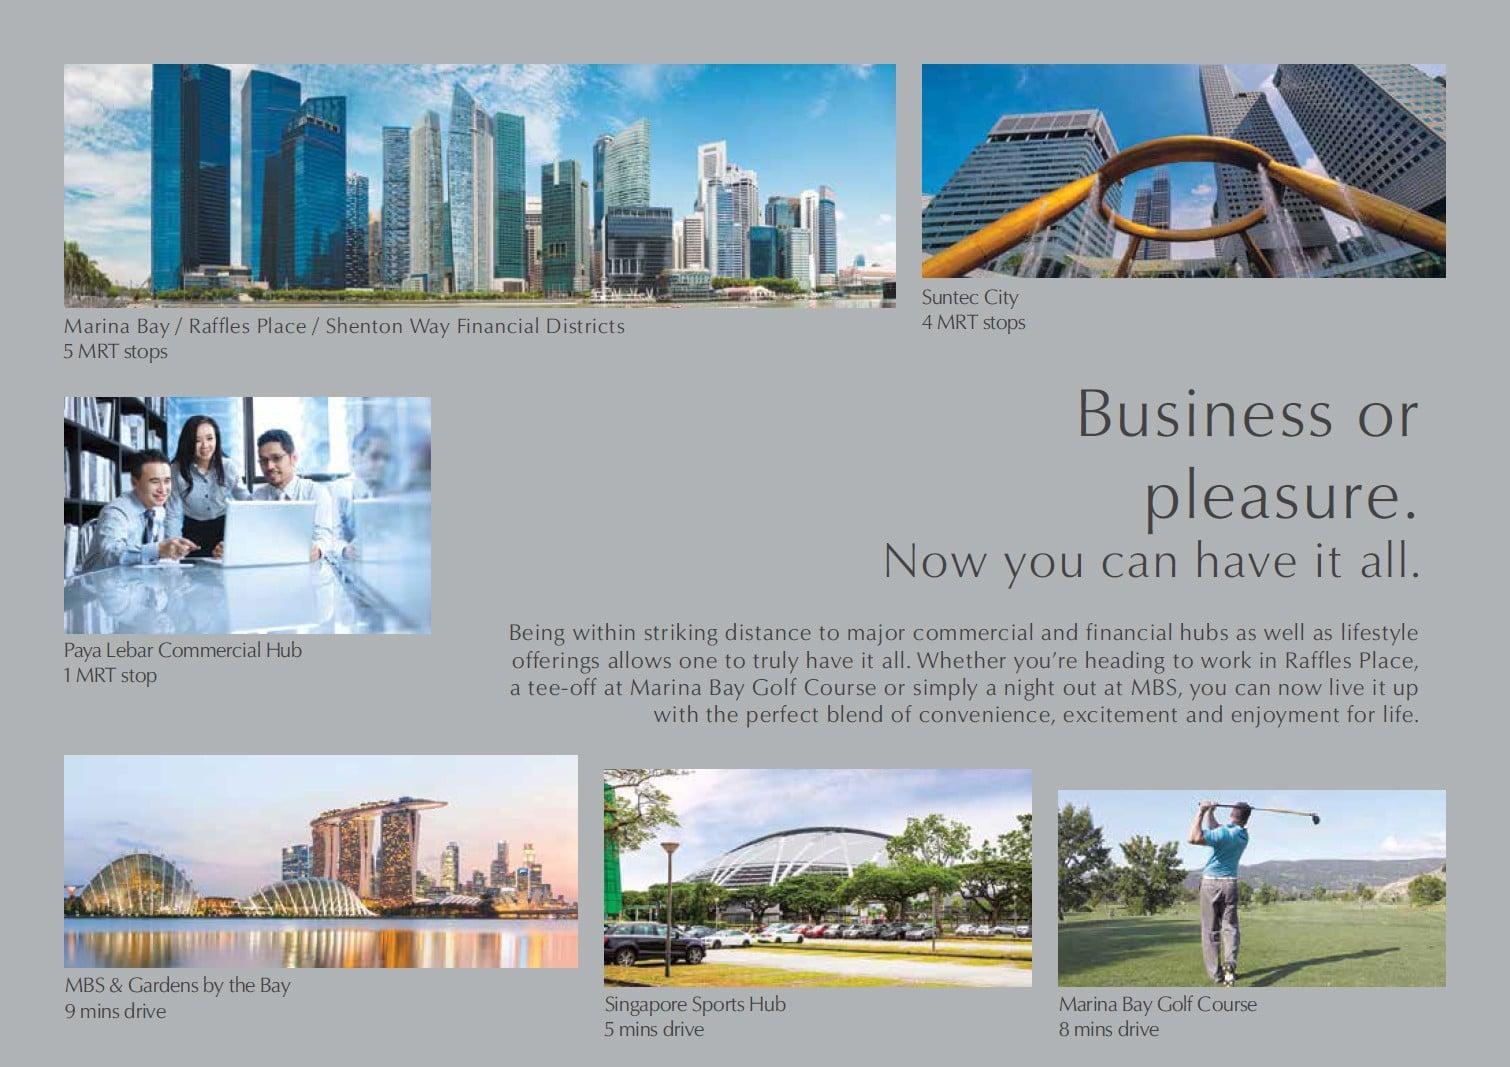 Rezi24-Amenities_Business_pleasure